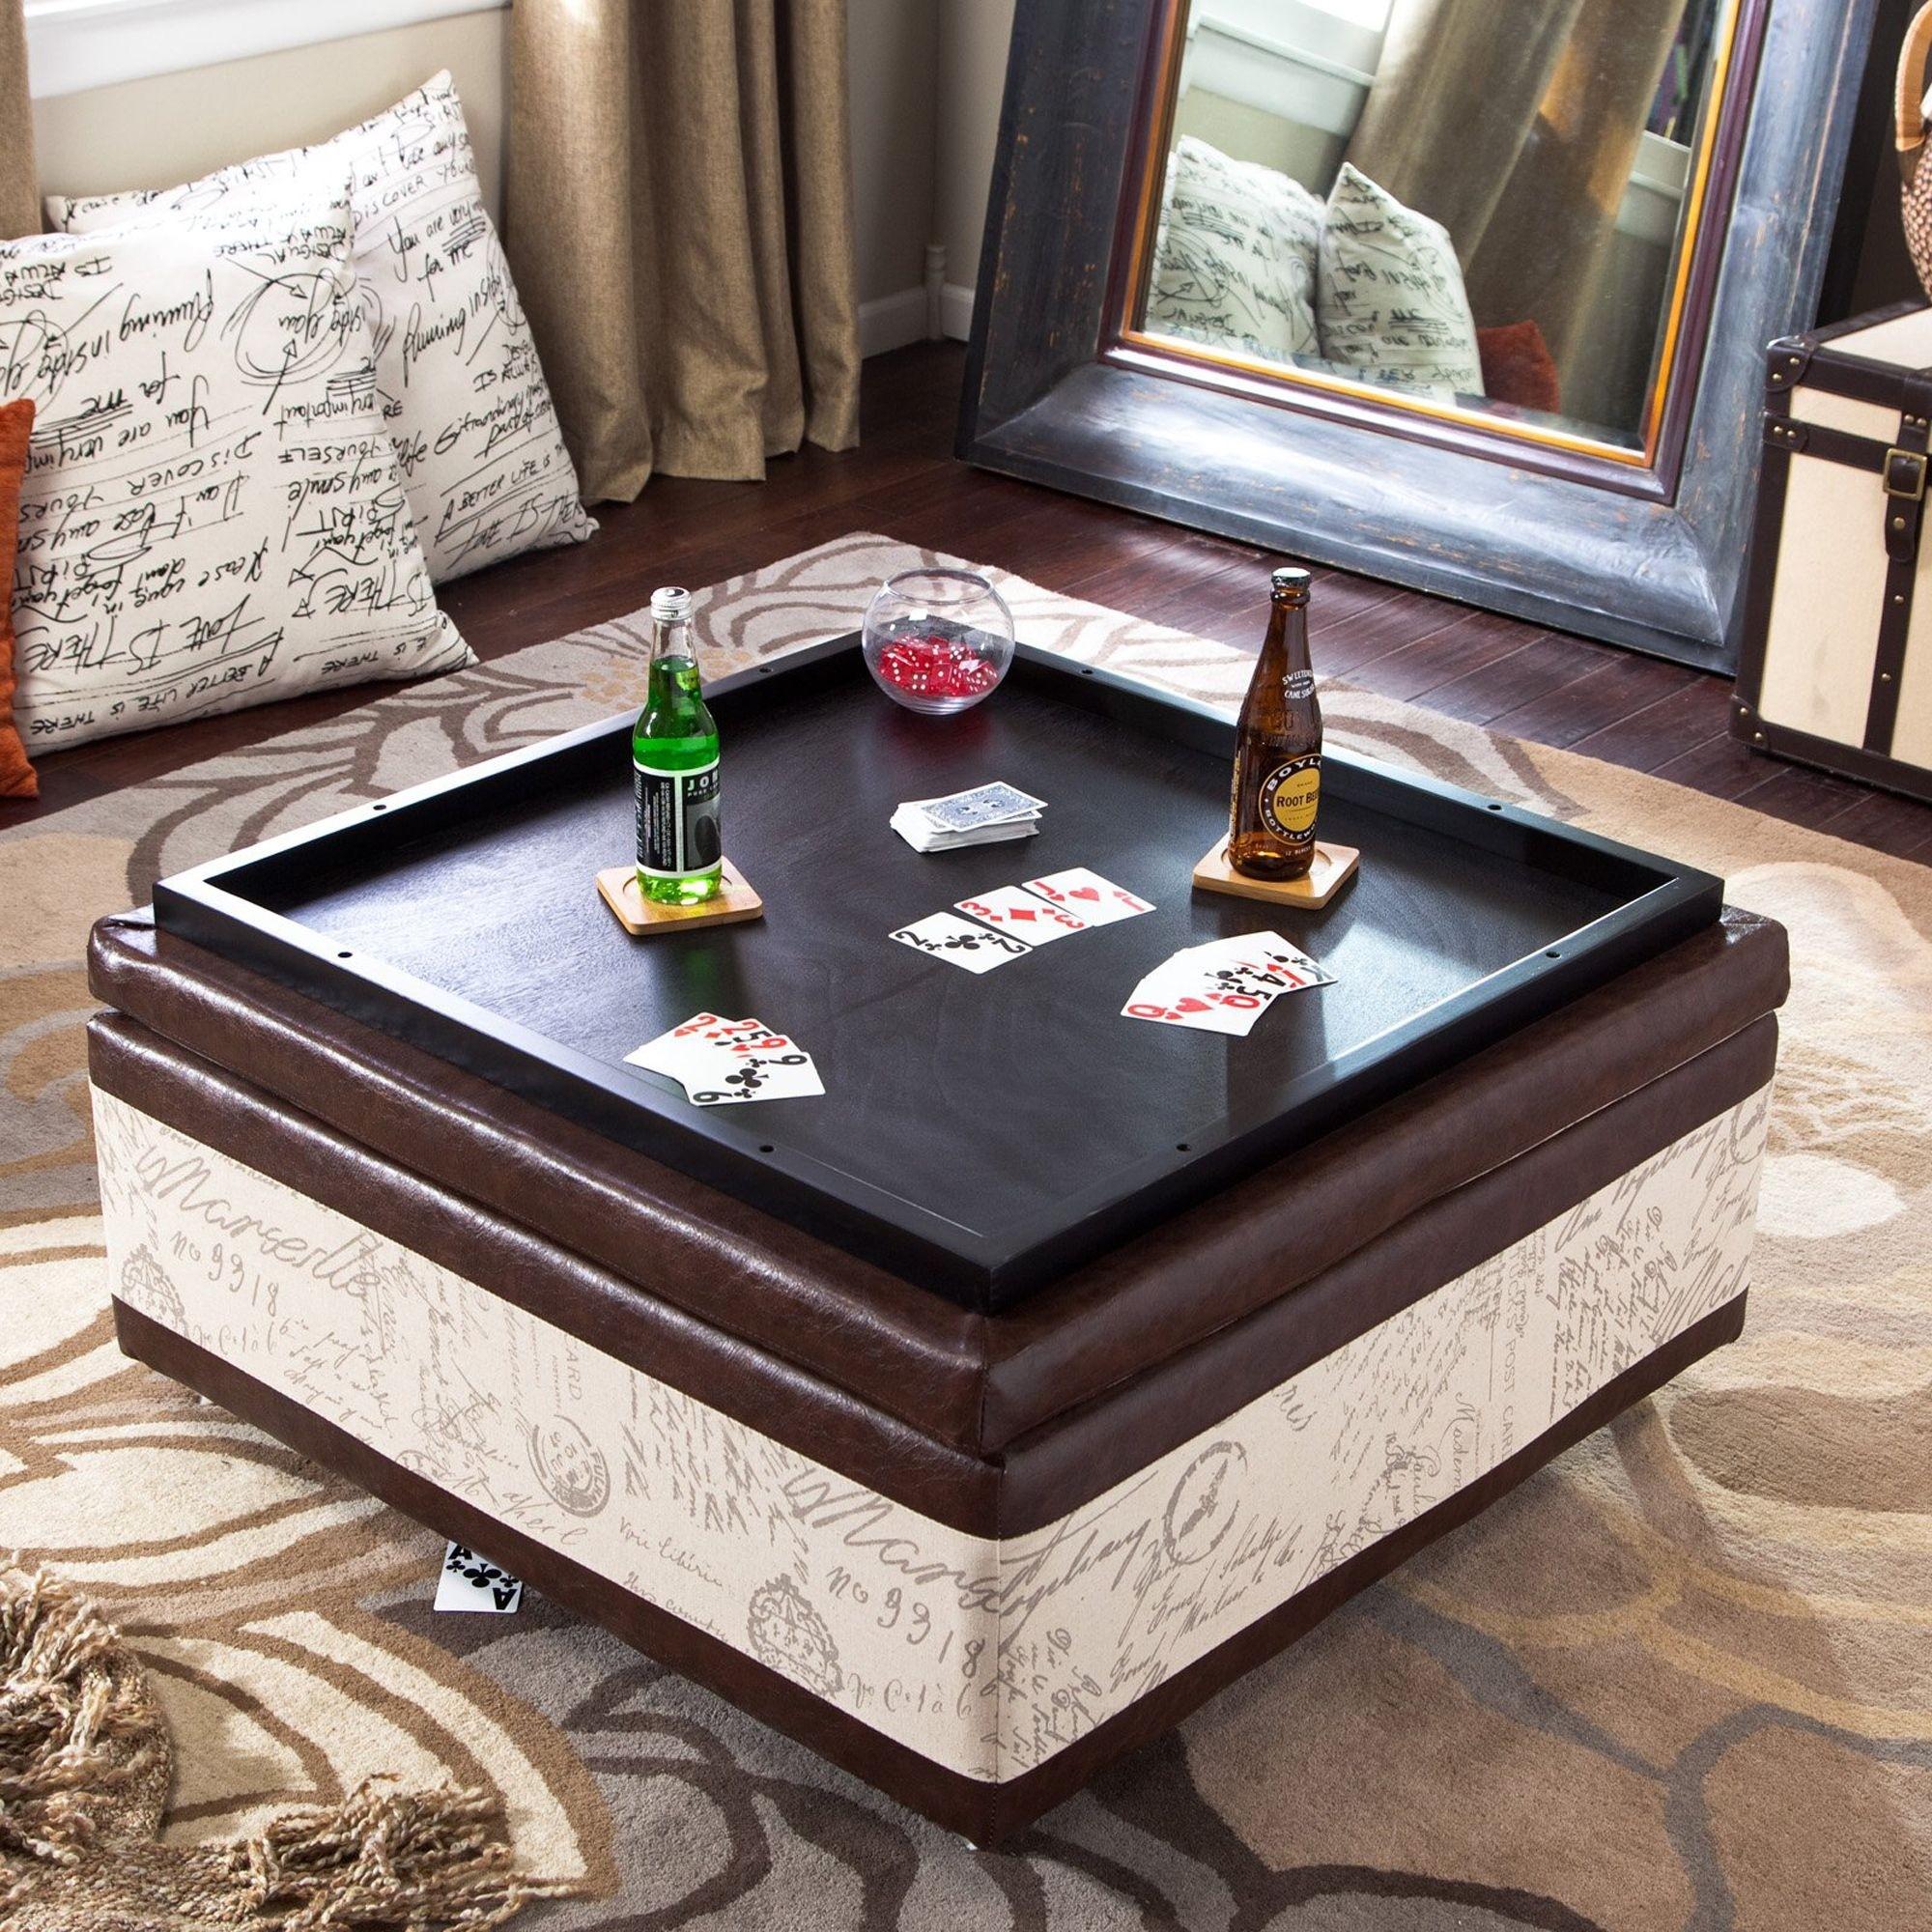 Ottoman Coffee Table On Photos of Decor